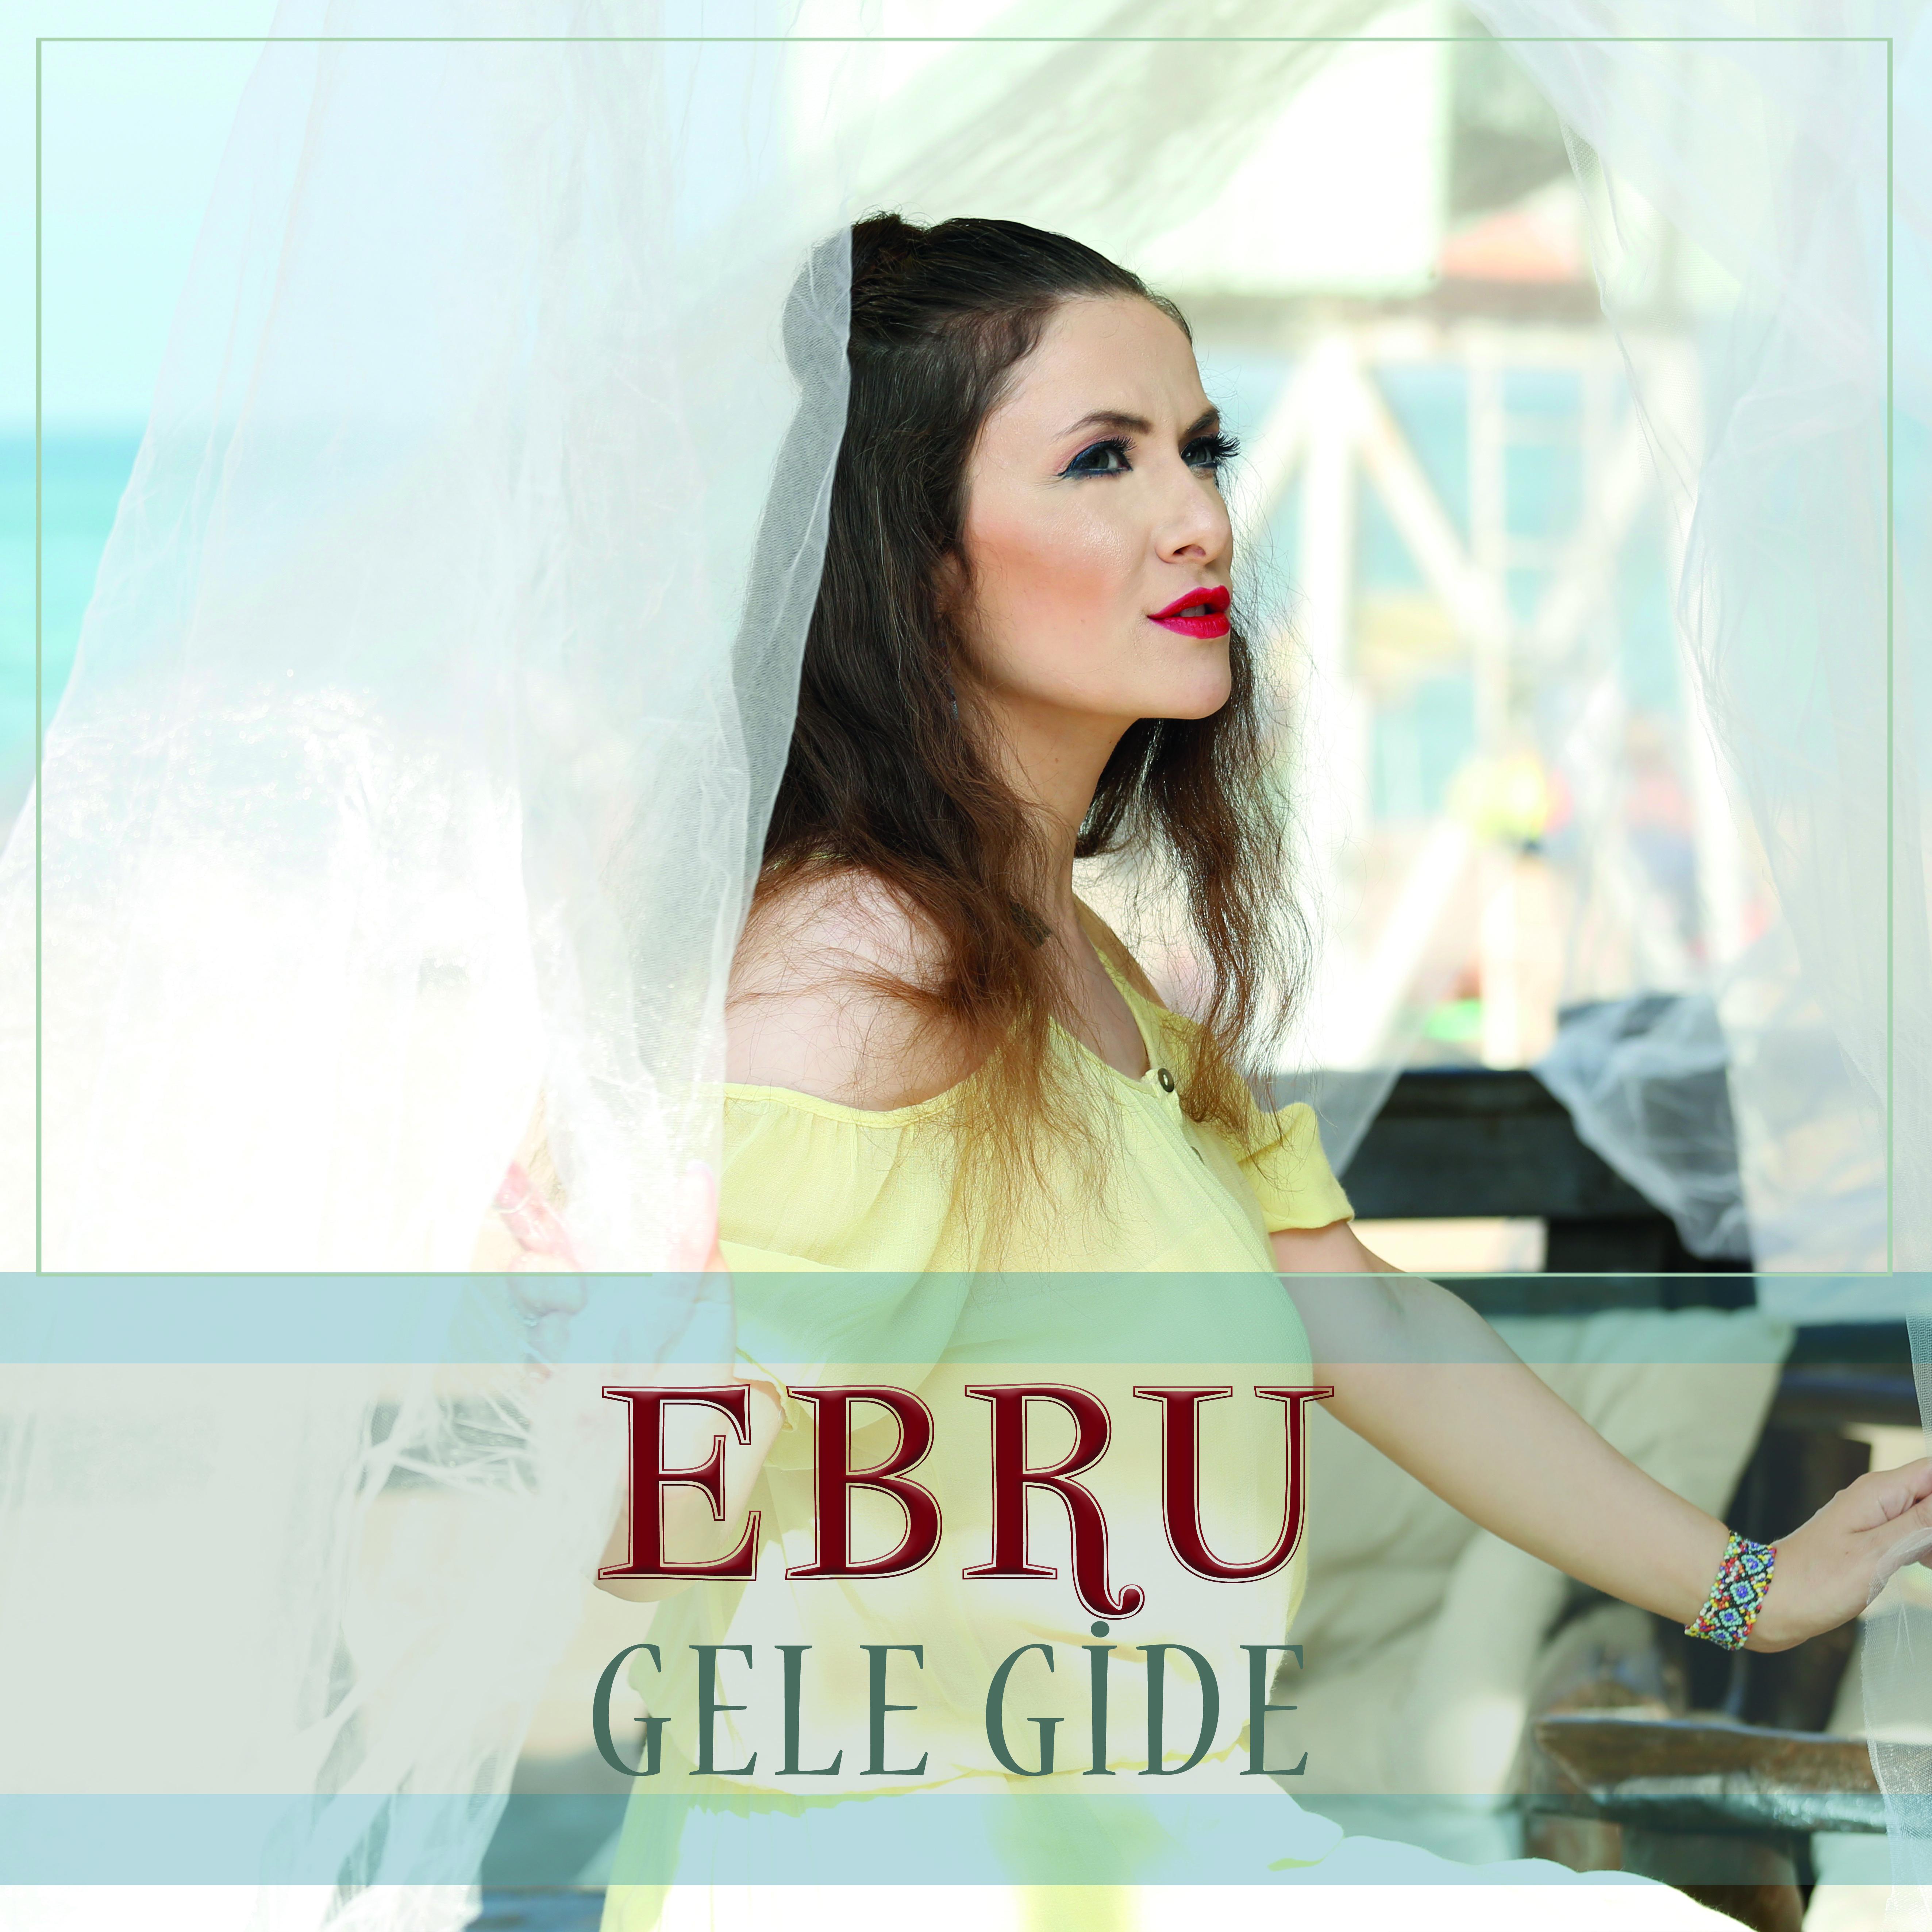 Ebru - Gele Gide